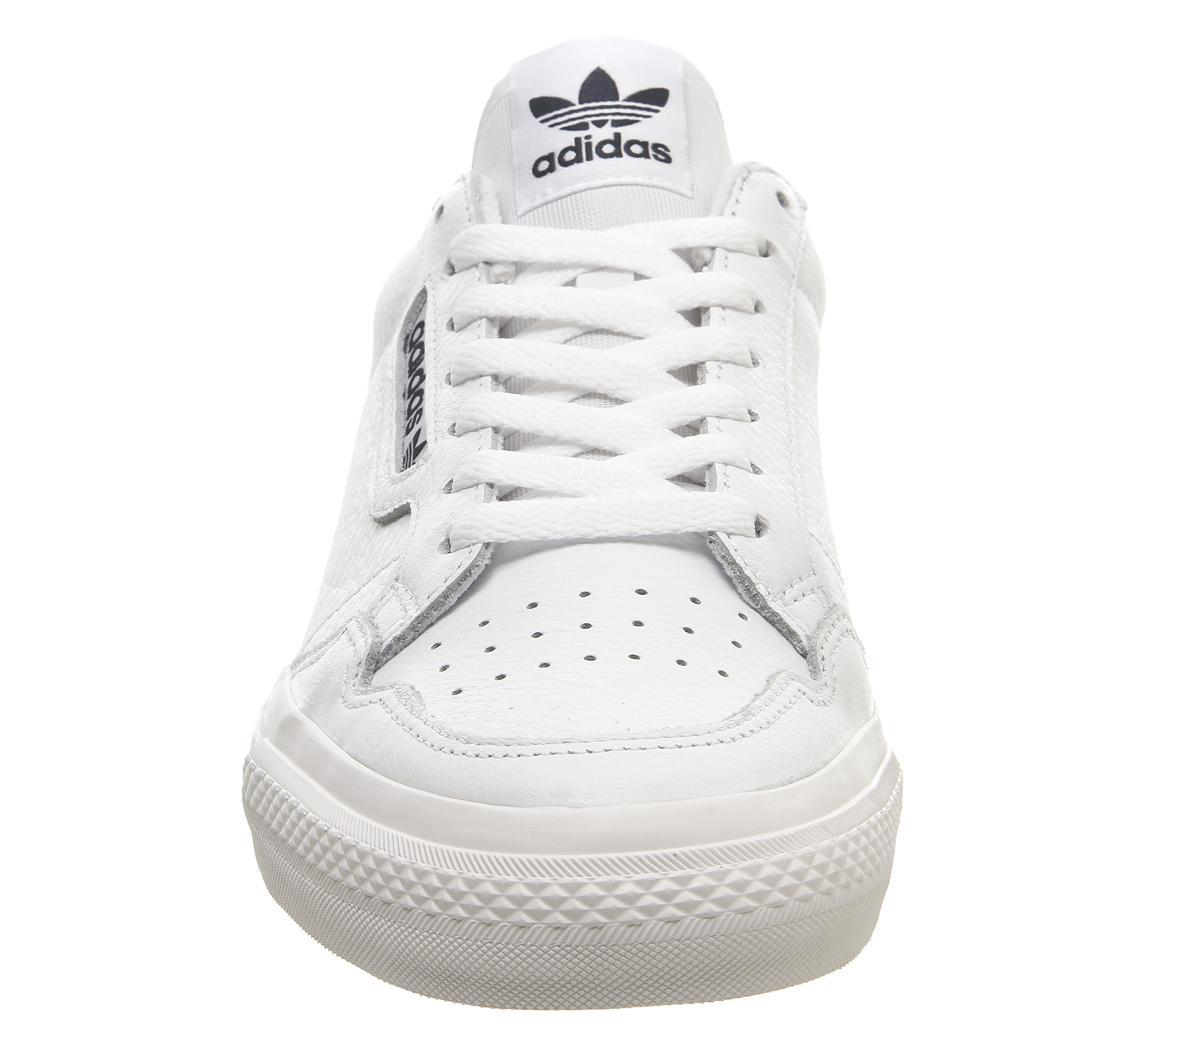 Adidas Continental Vulc Footwear WhiteCollegiate Navy 90 €70